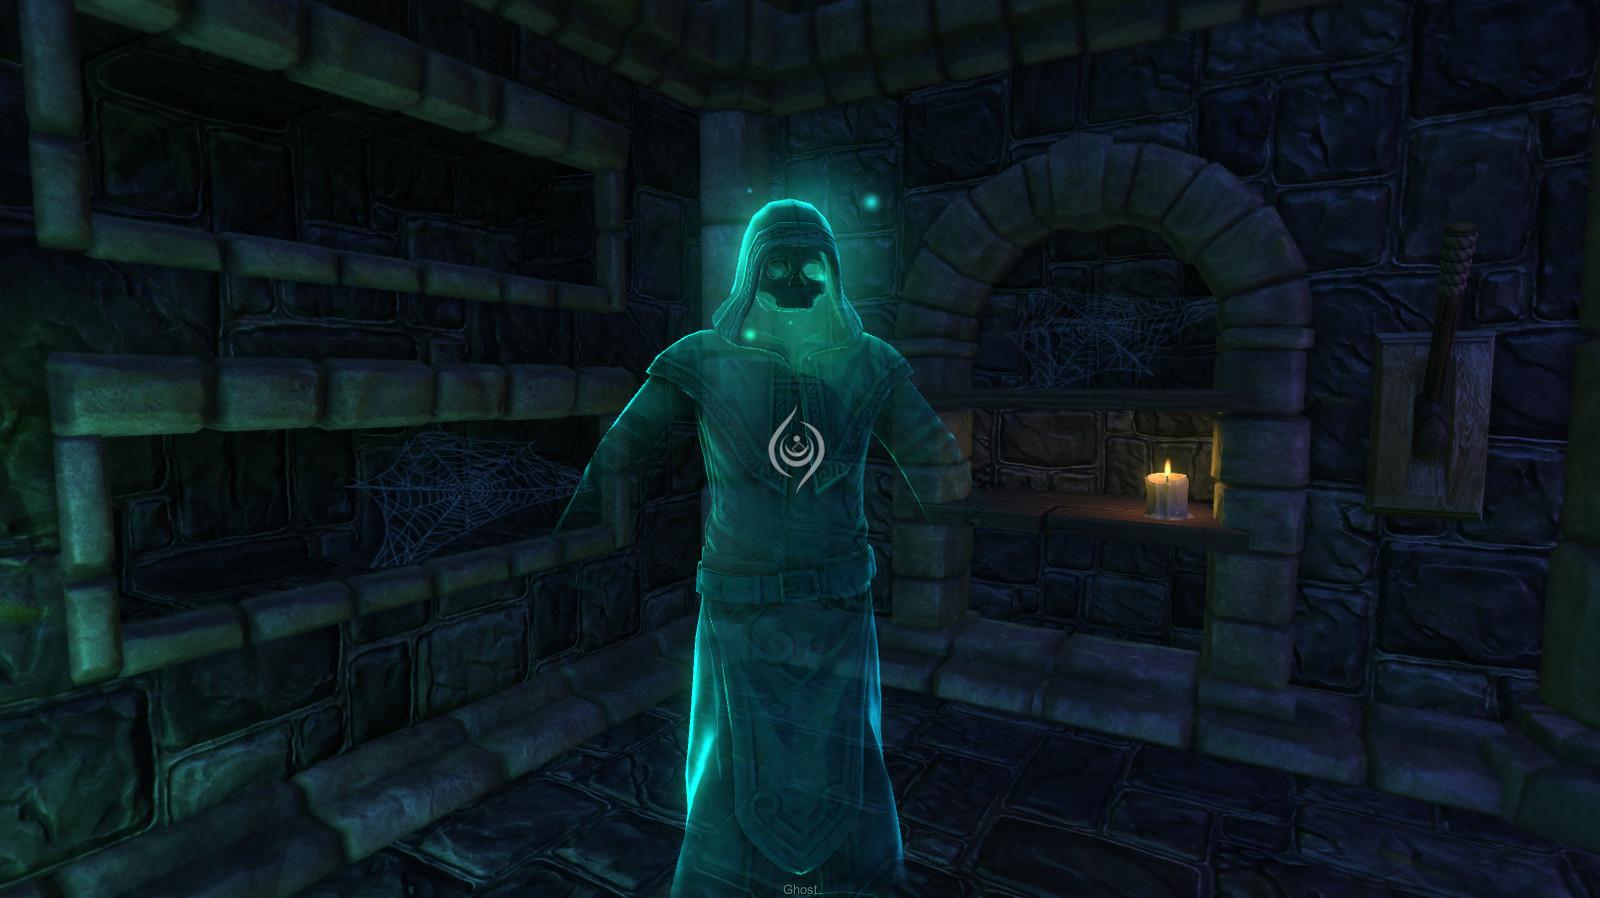 Ghost NPC